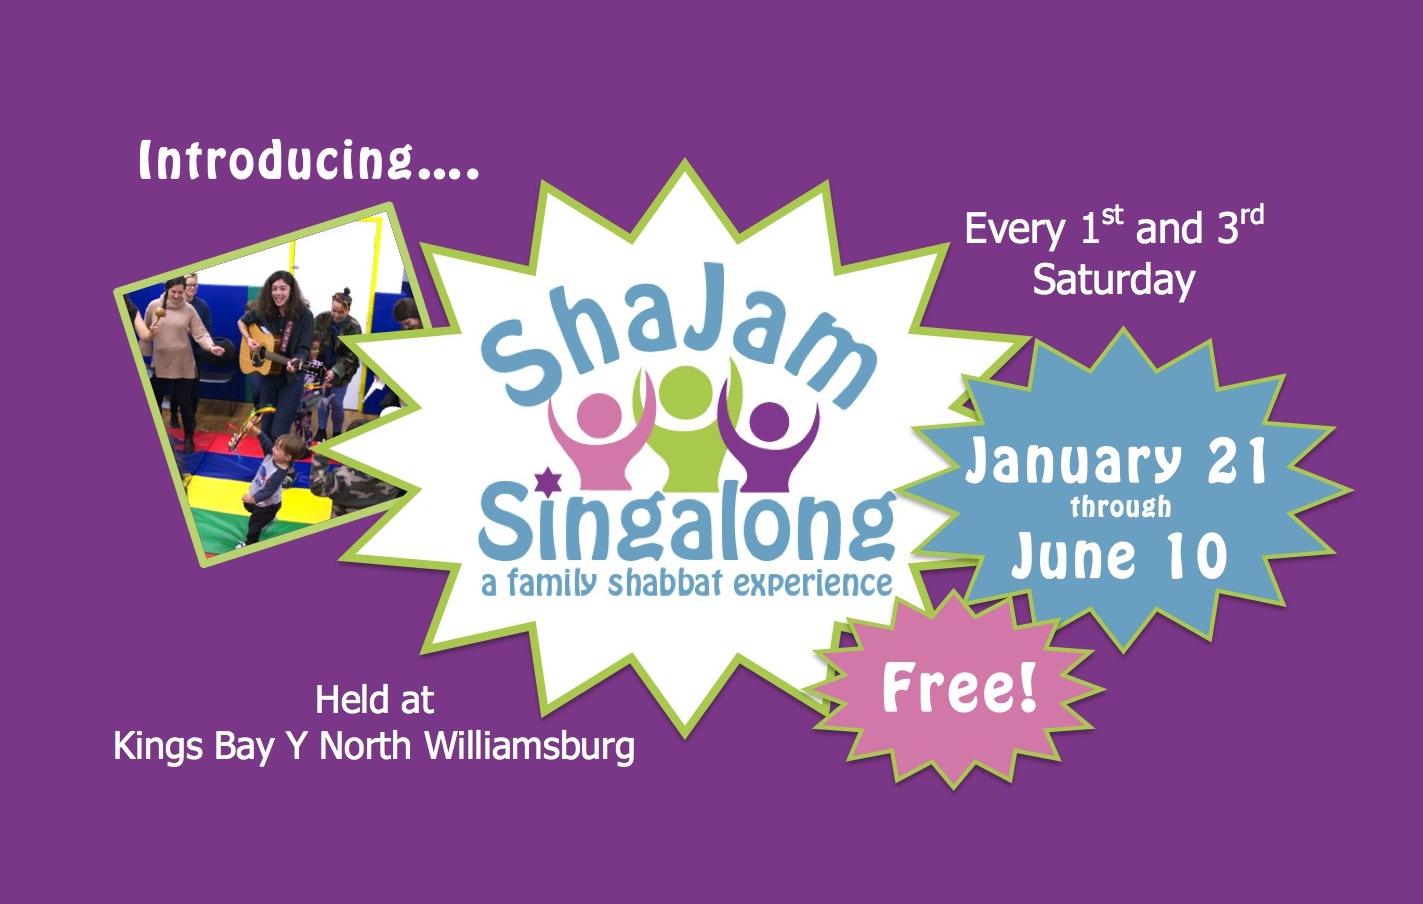 ShaJam-Homepage-Image-1